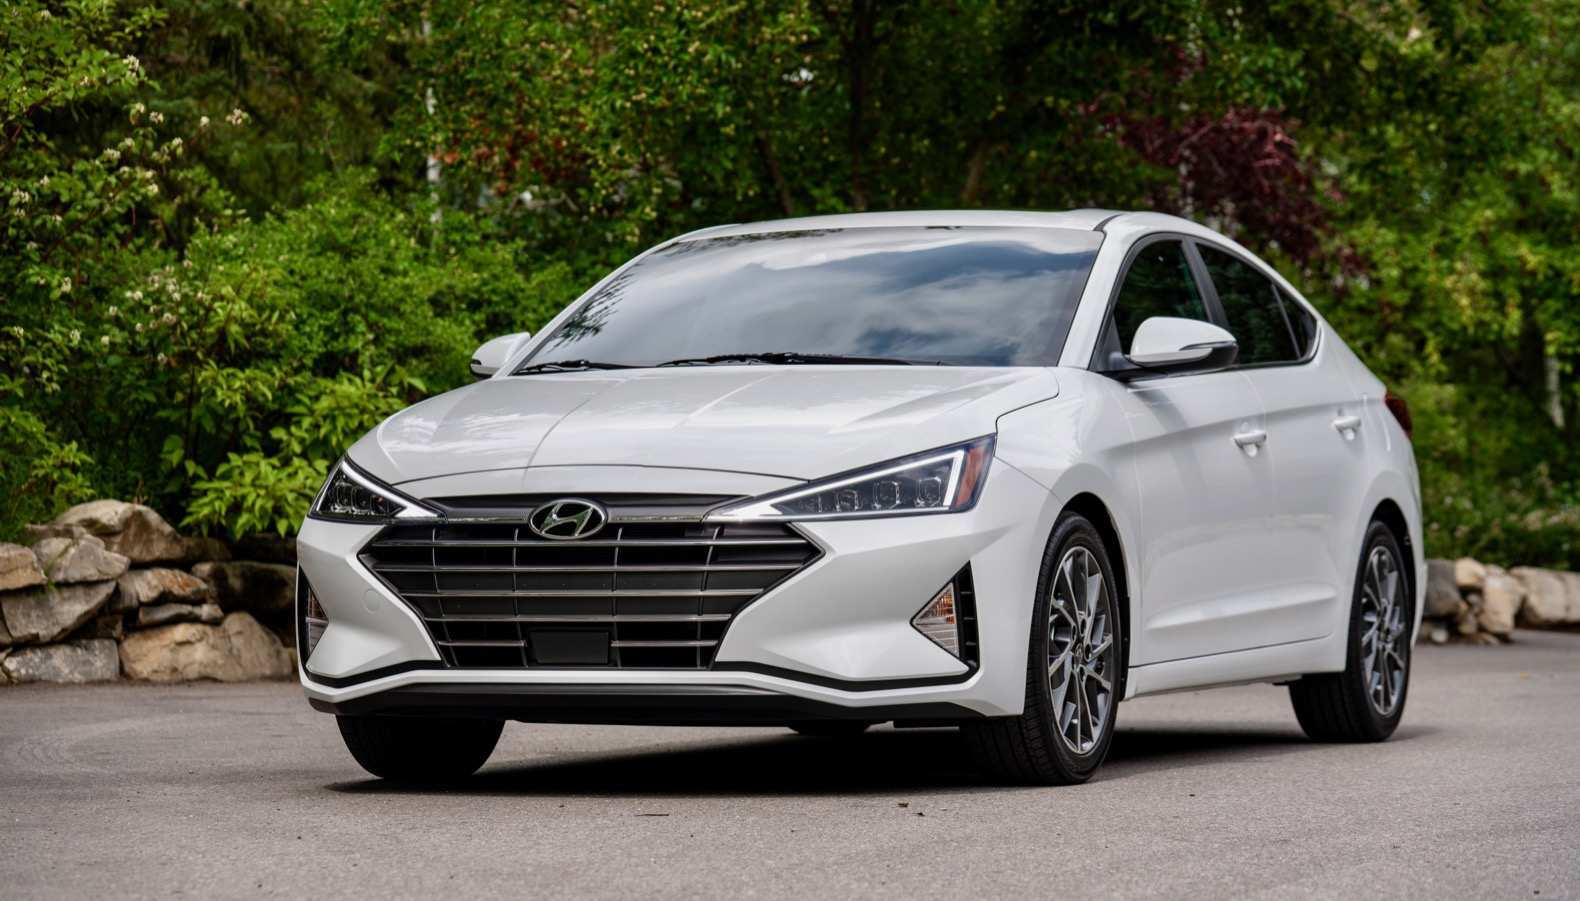 72 Concept of 2019 Hyundai Elantra Redesign and Concept with 2019 Hyundai Elantra